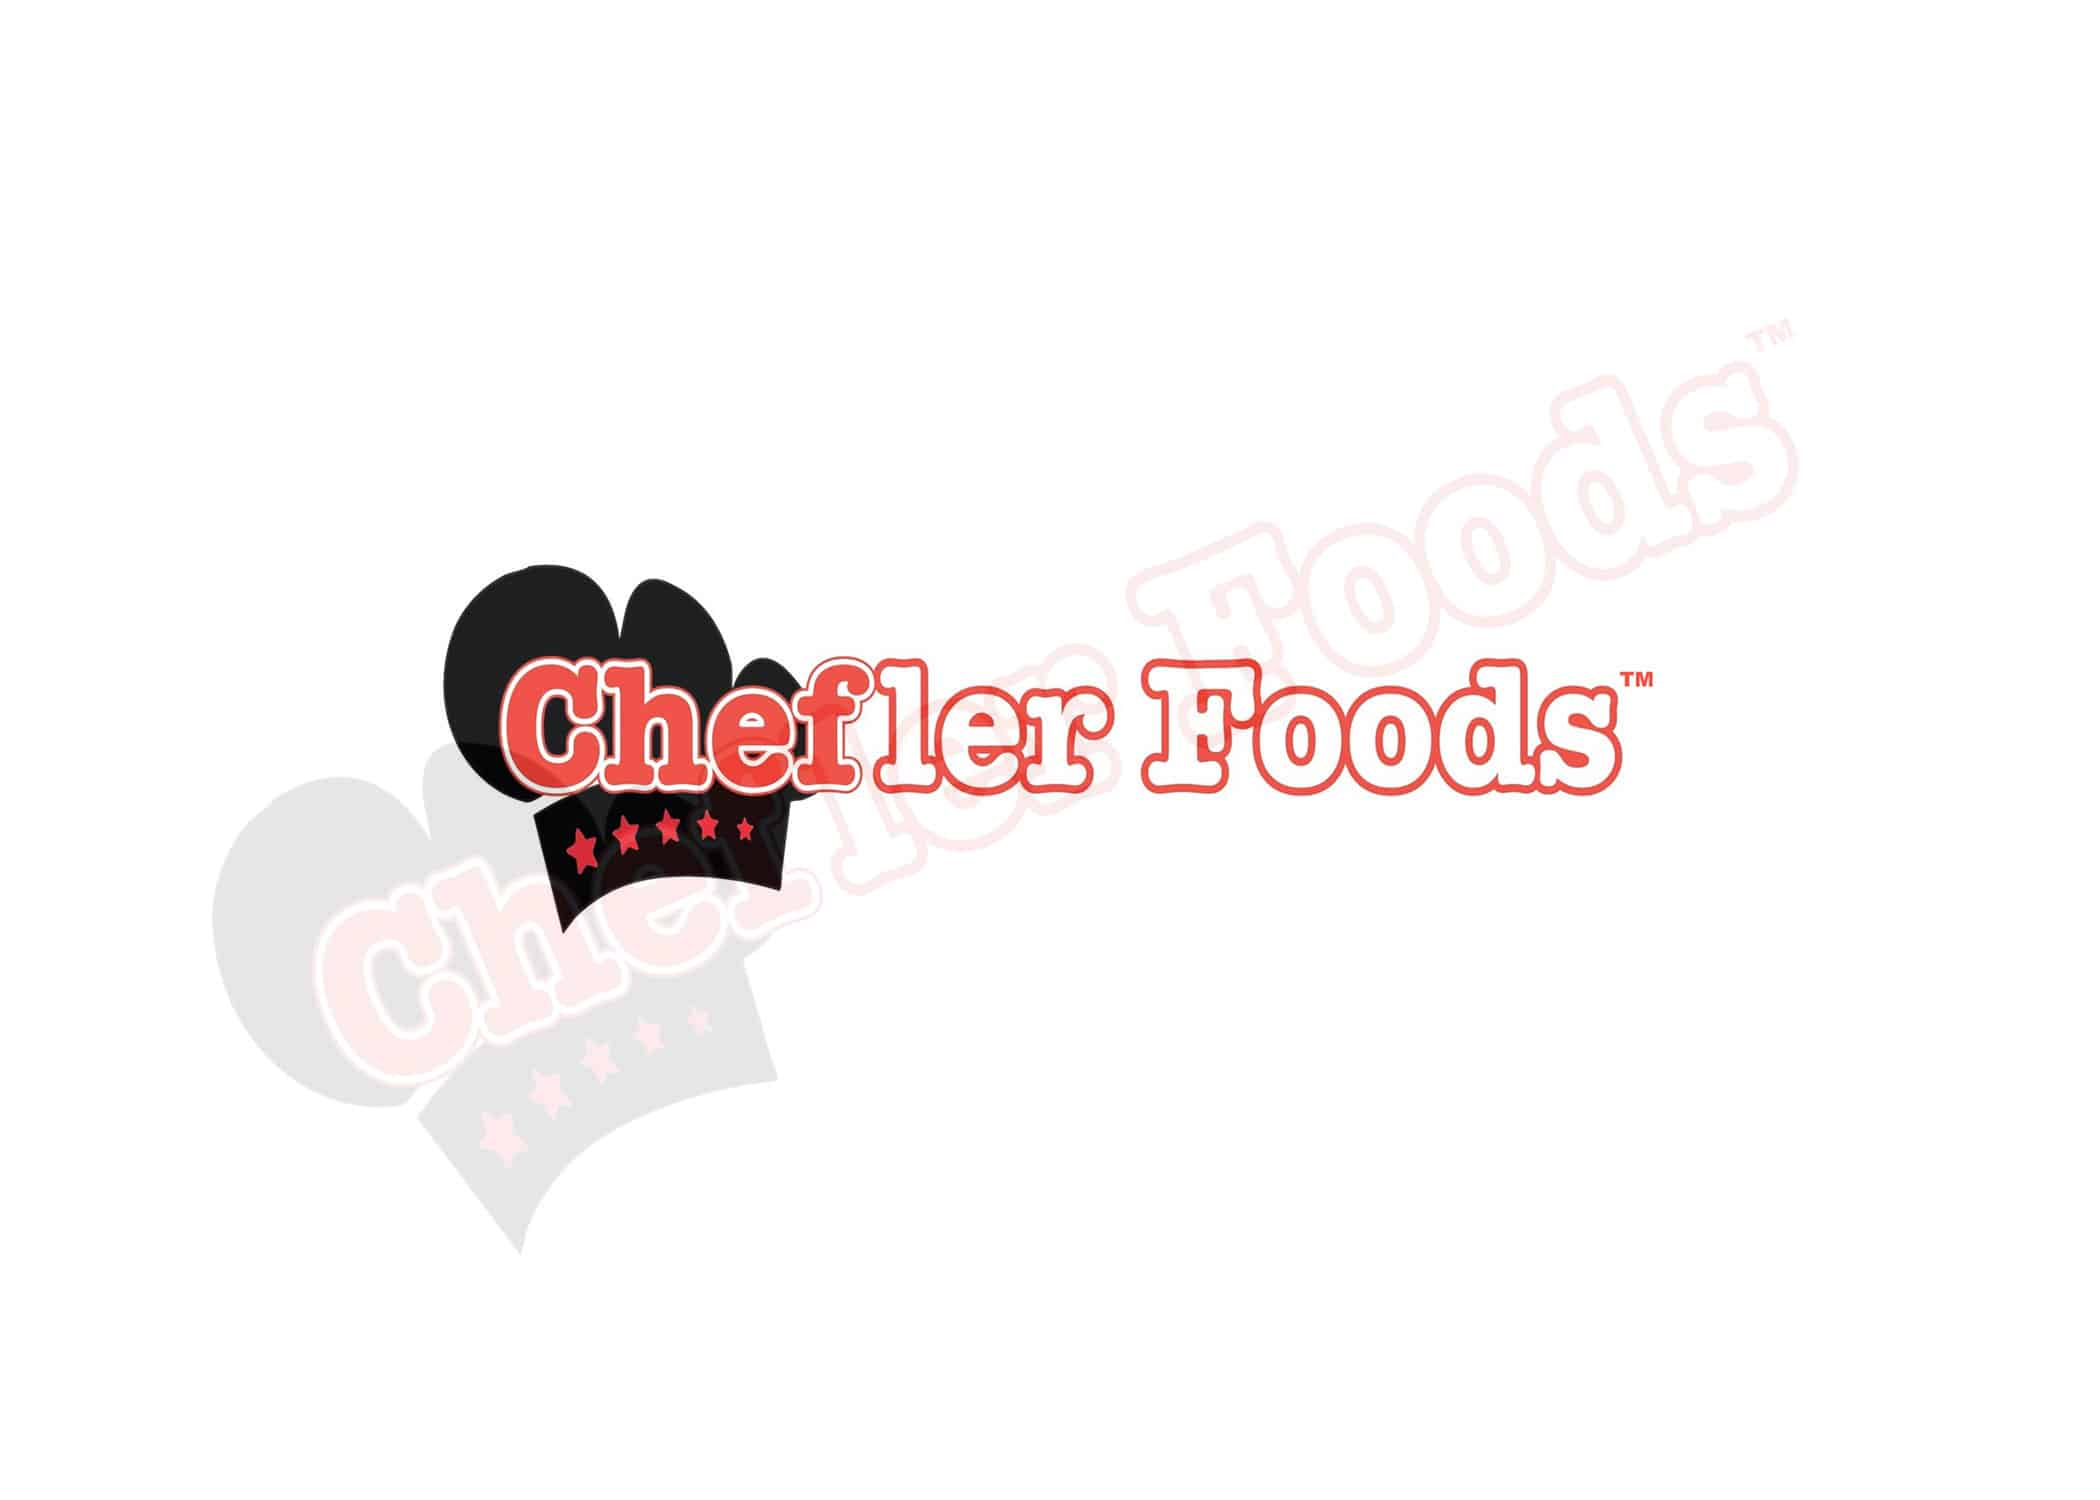 https://cheflerfoods.com/wp-content/uploads/2020/07/chefler-foods-chefler-foods-logo.jpg